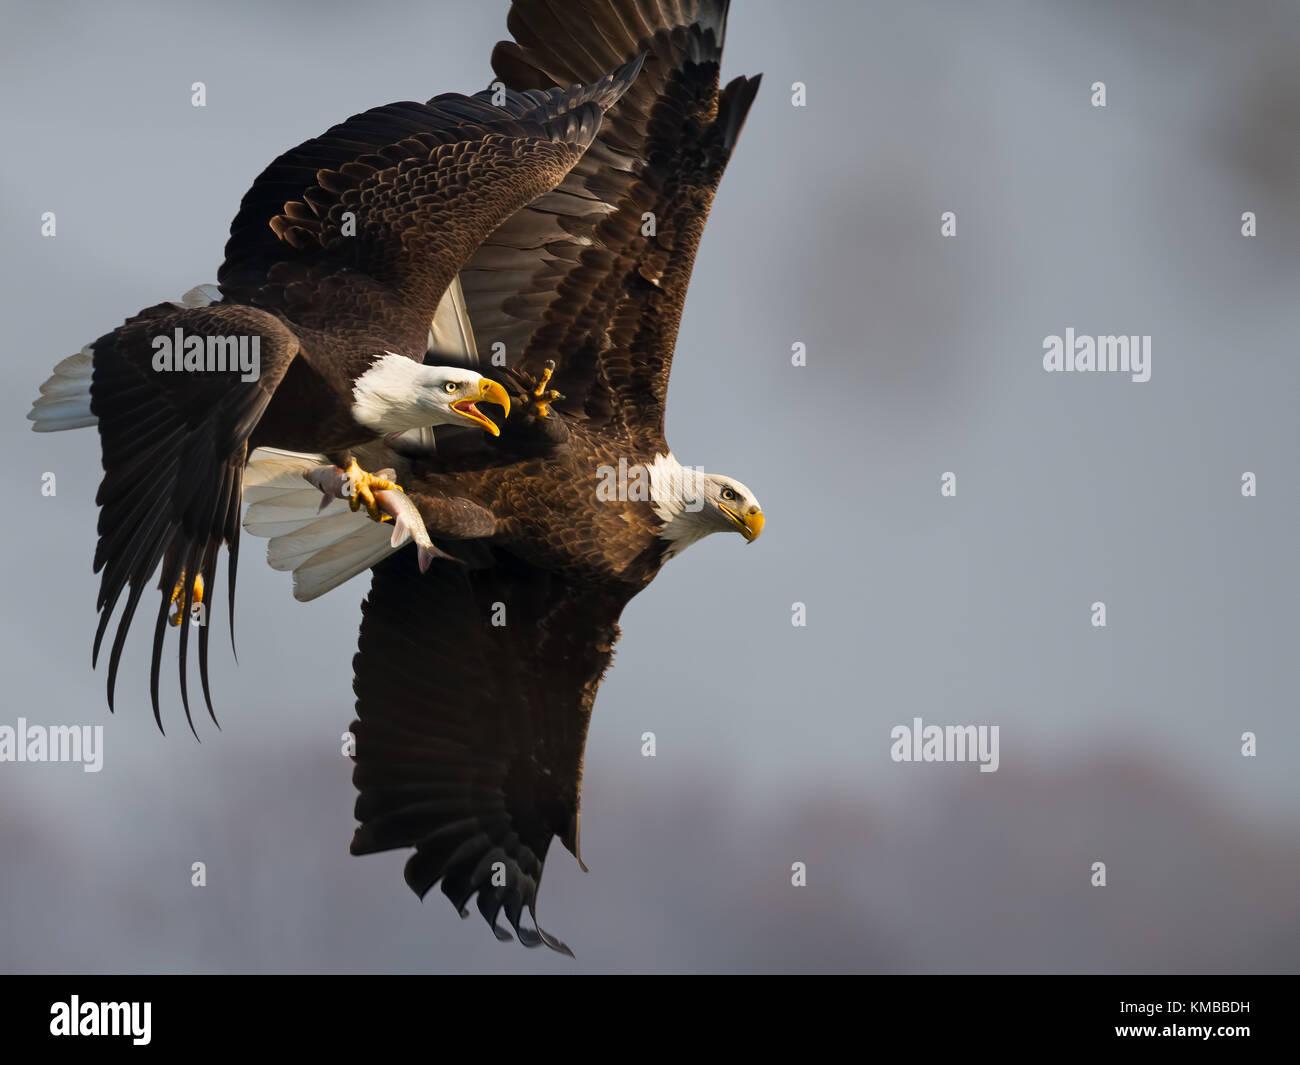 Bald Eagle Battle - Stock Image